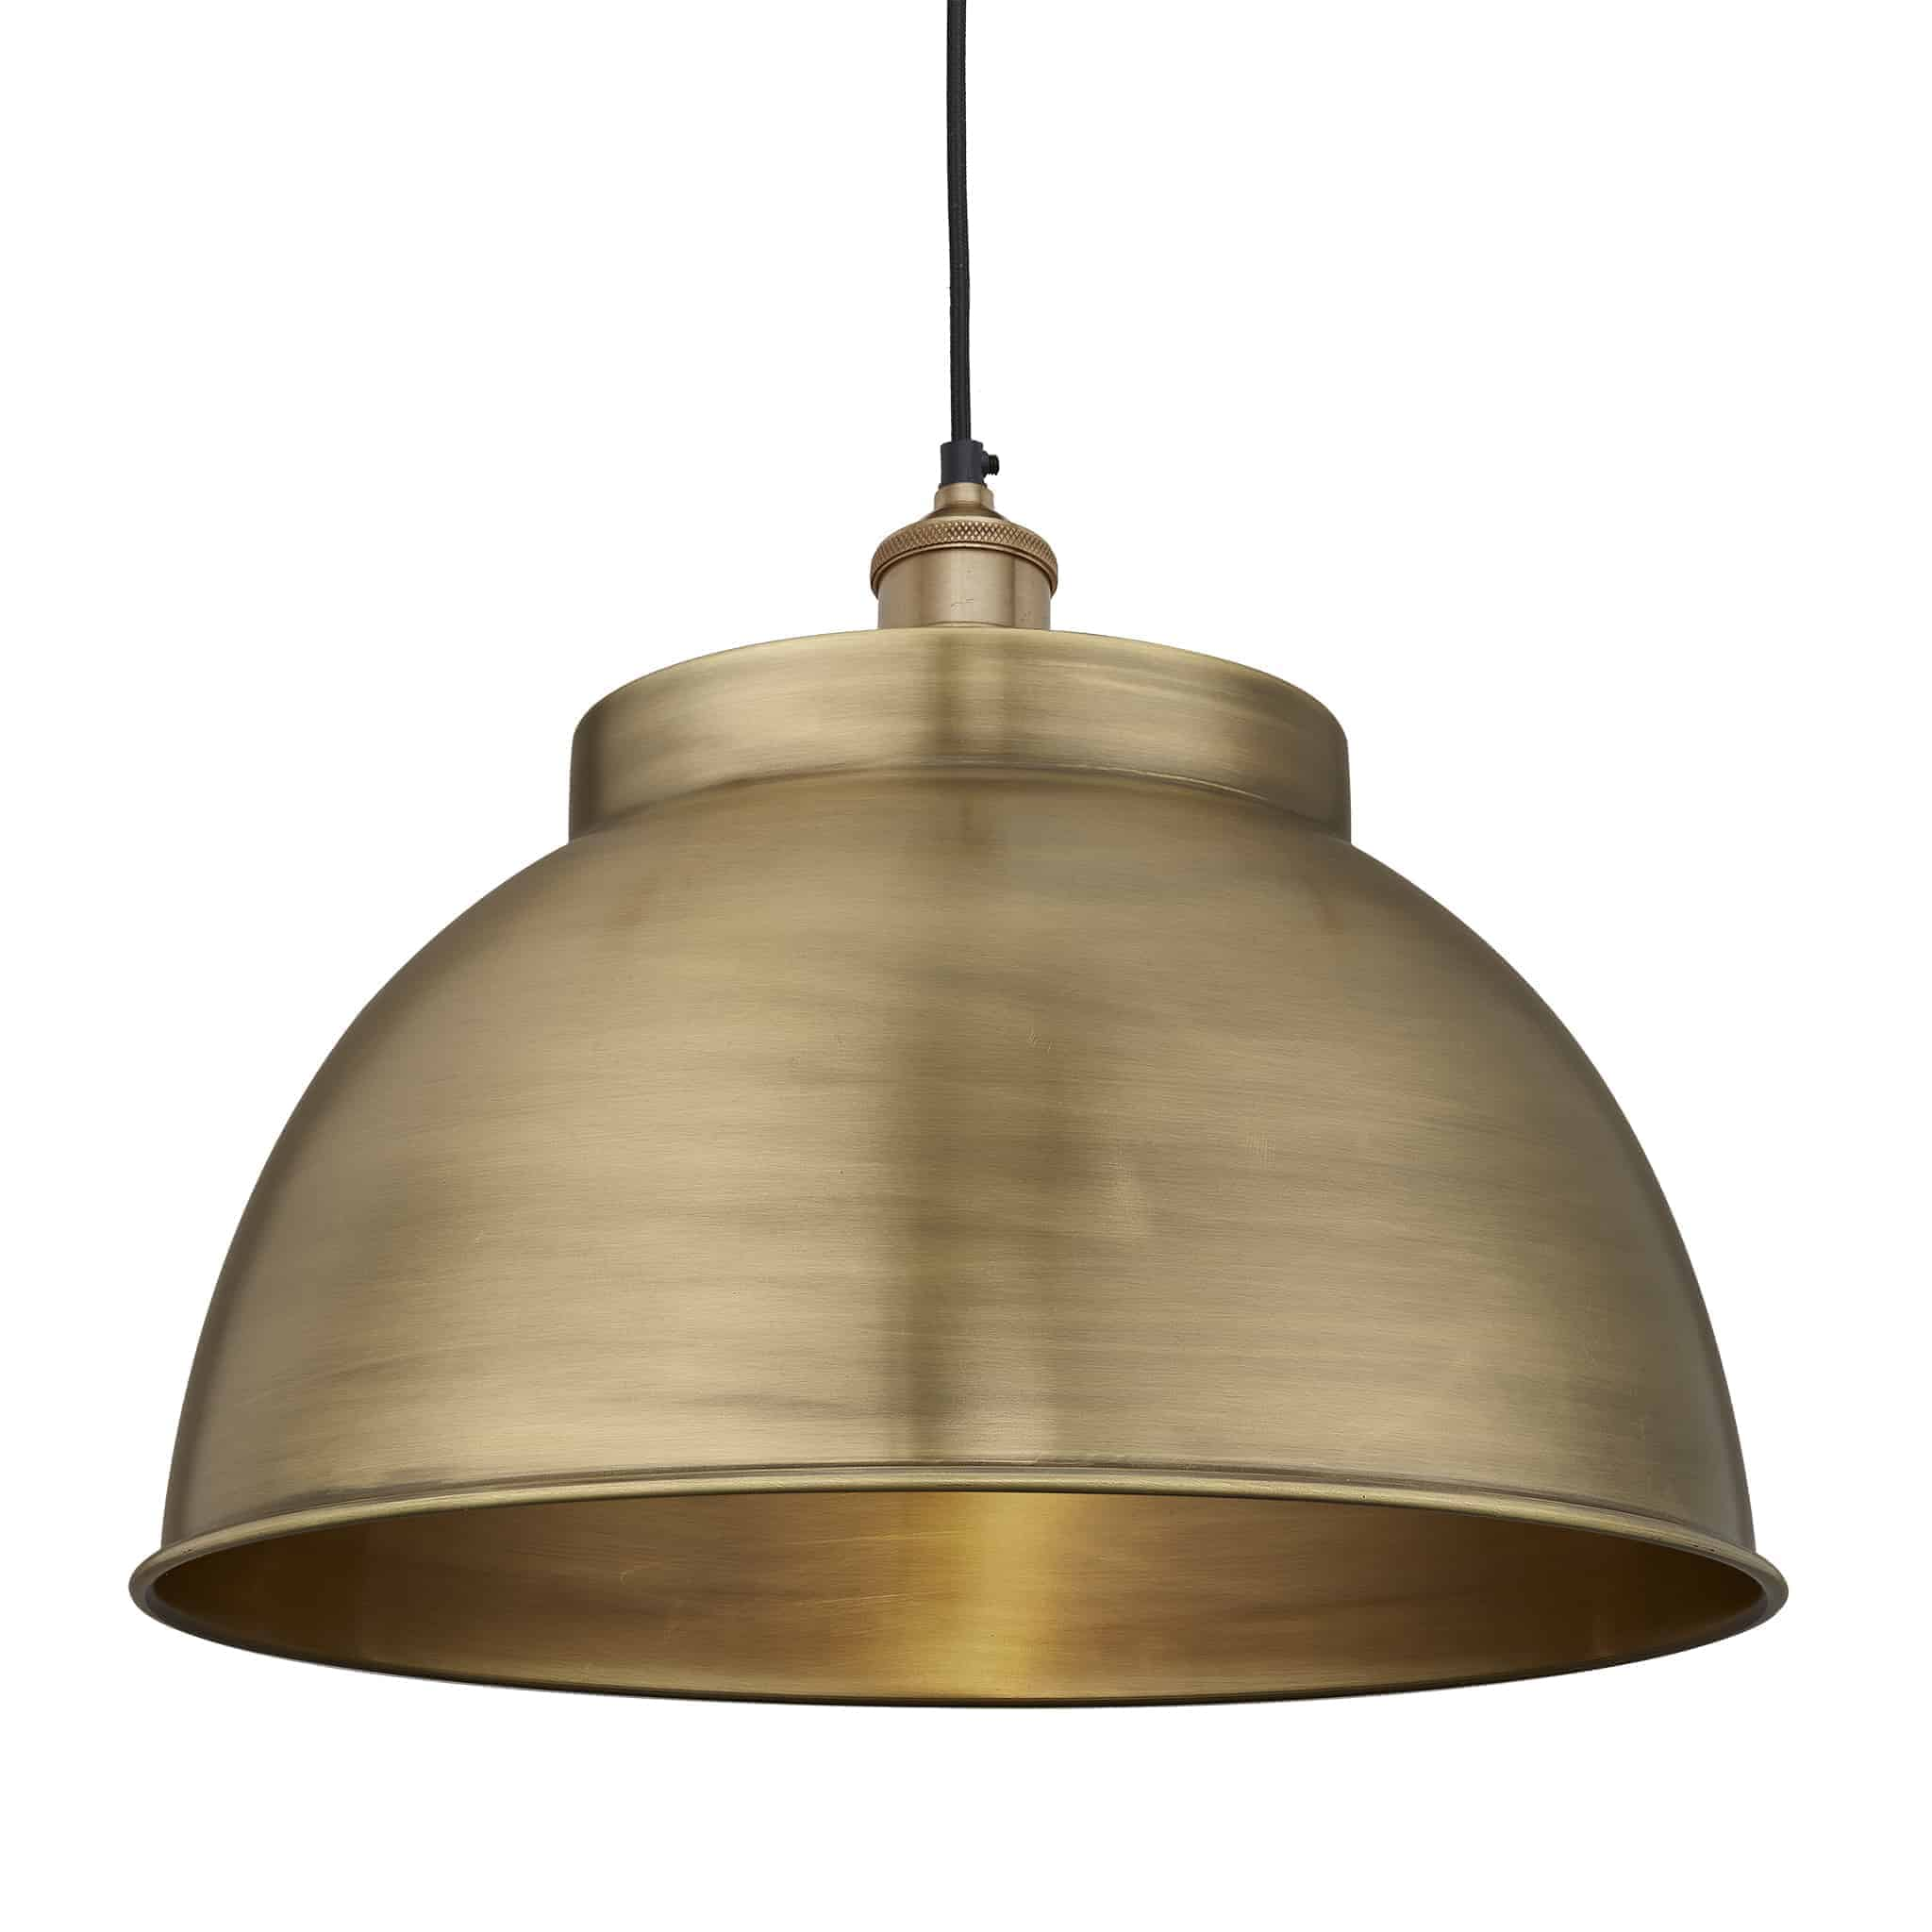 Industville Brooklyn Dome Pendant – 17 Inch Brass